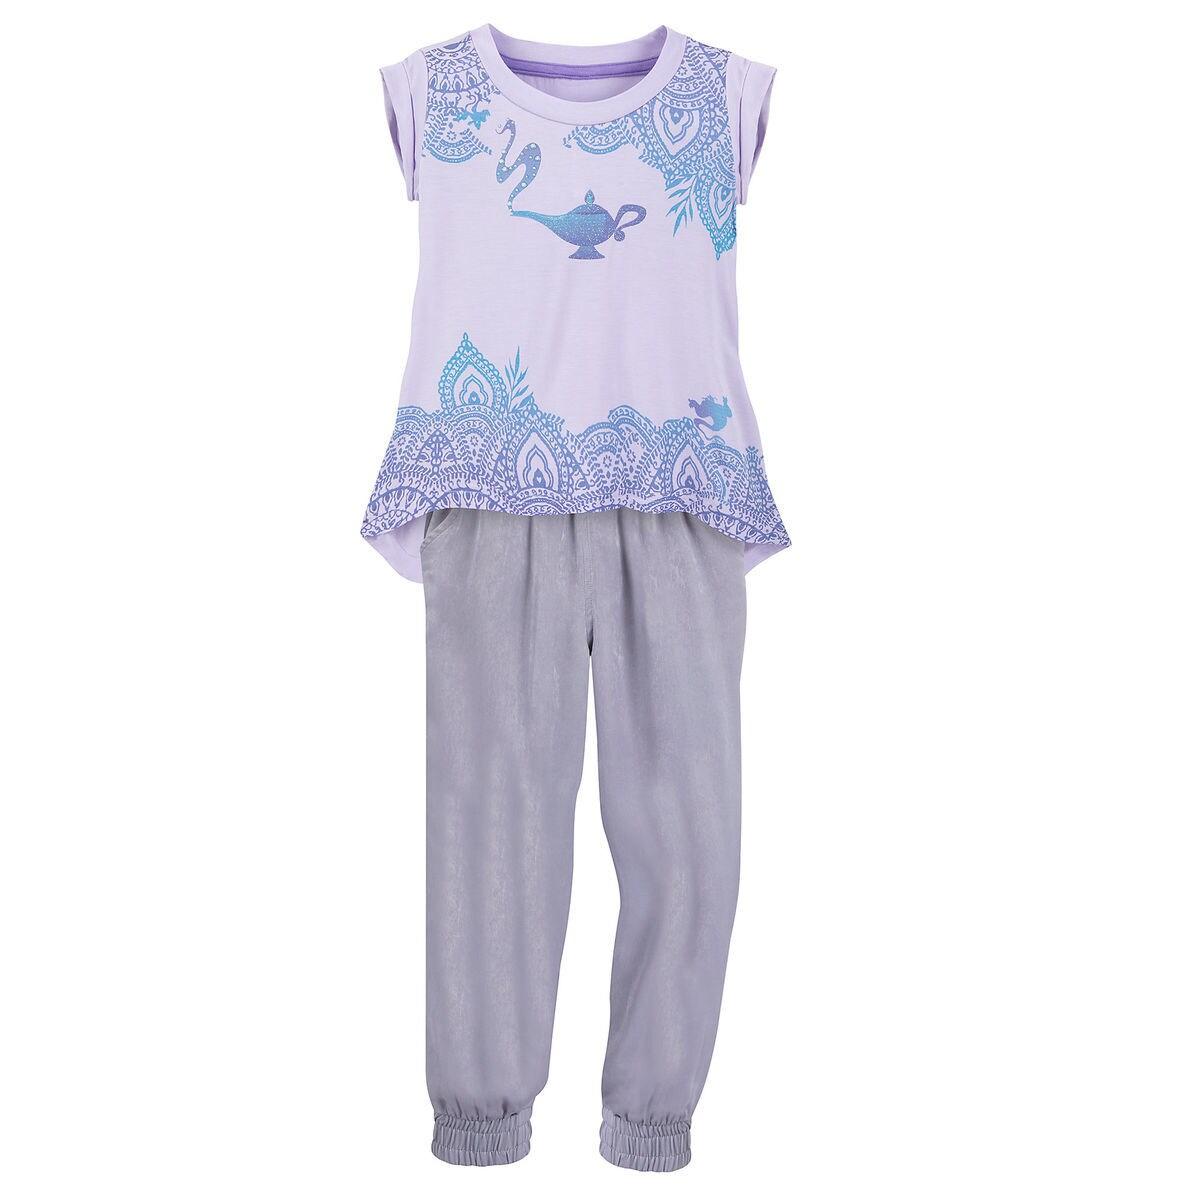 4e6f889694159 Product Image of Jasmine Pants Set for Girls   1